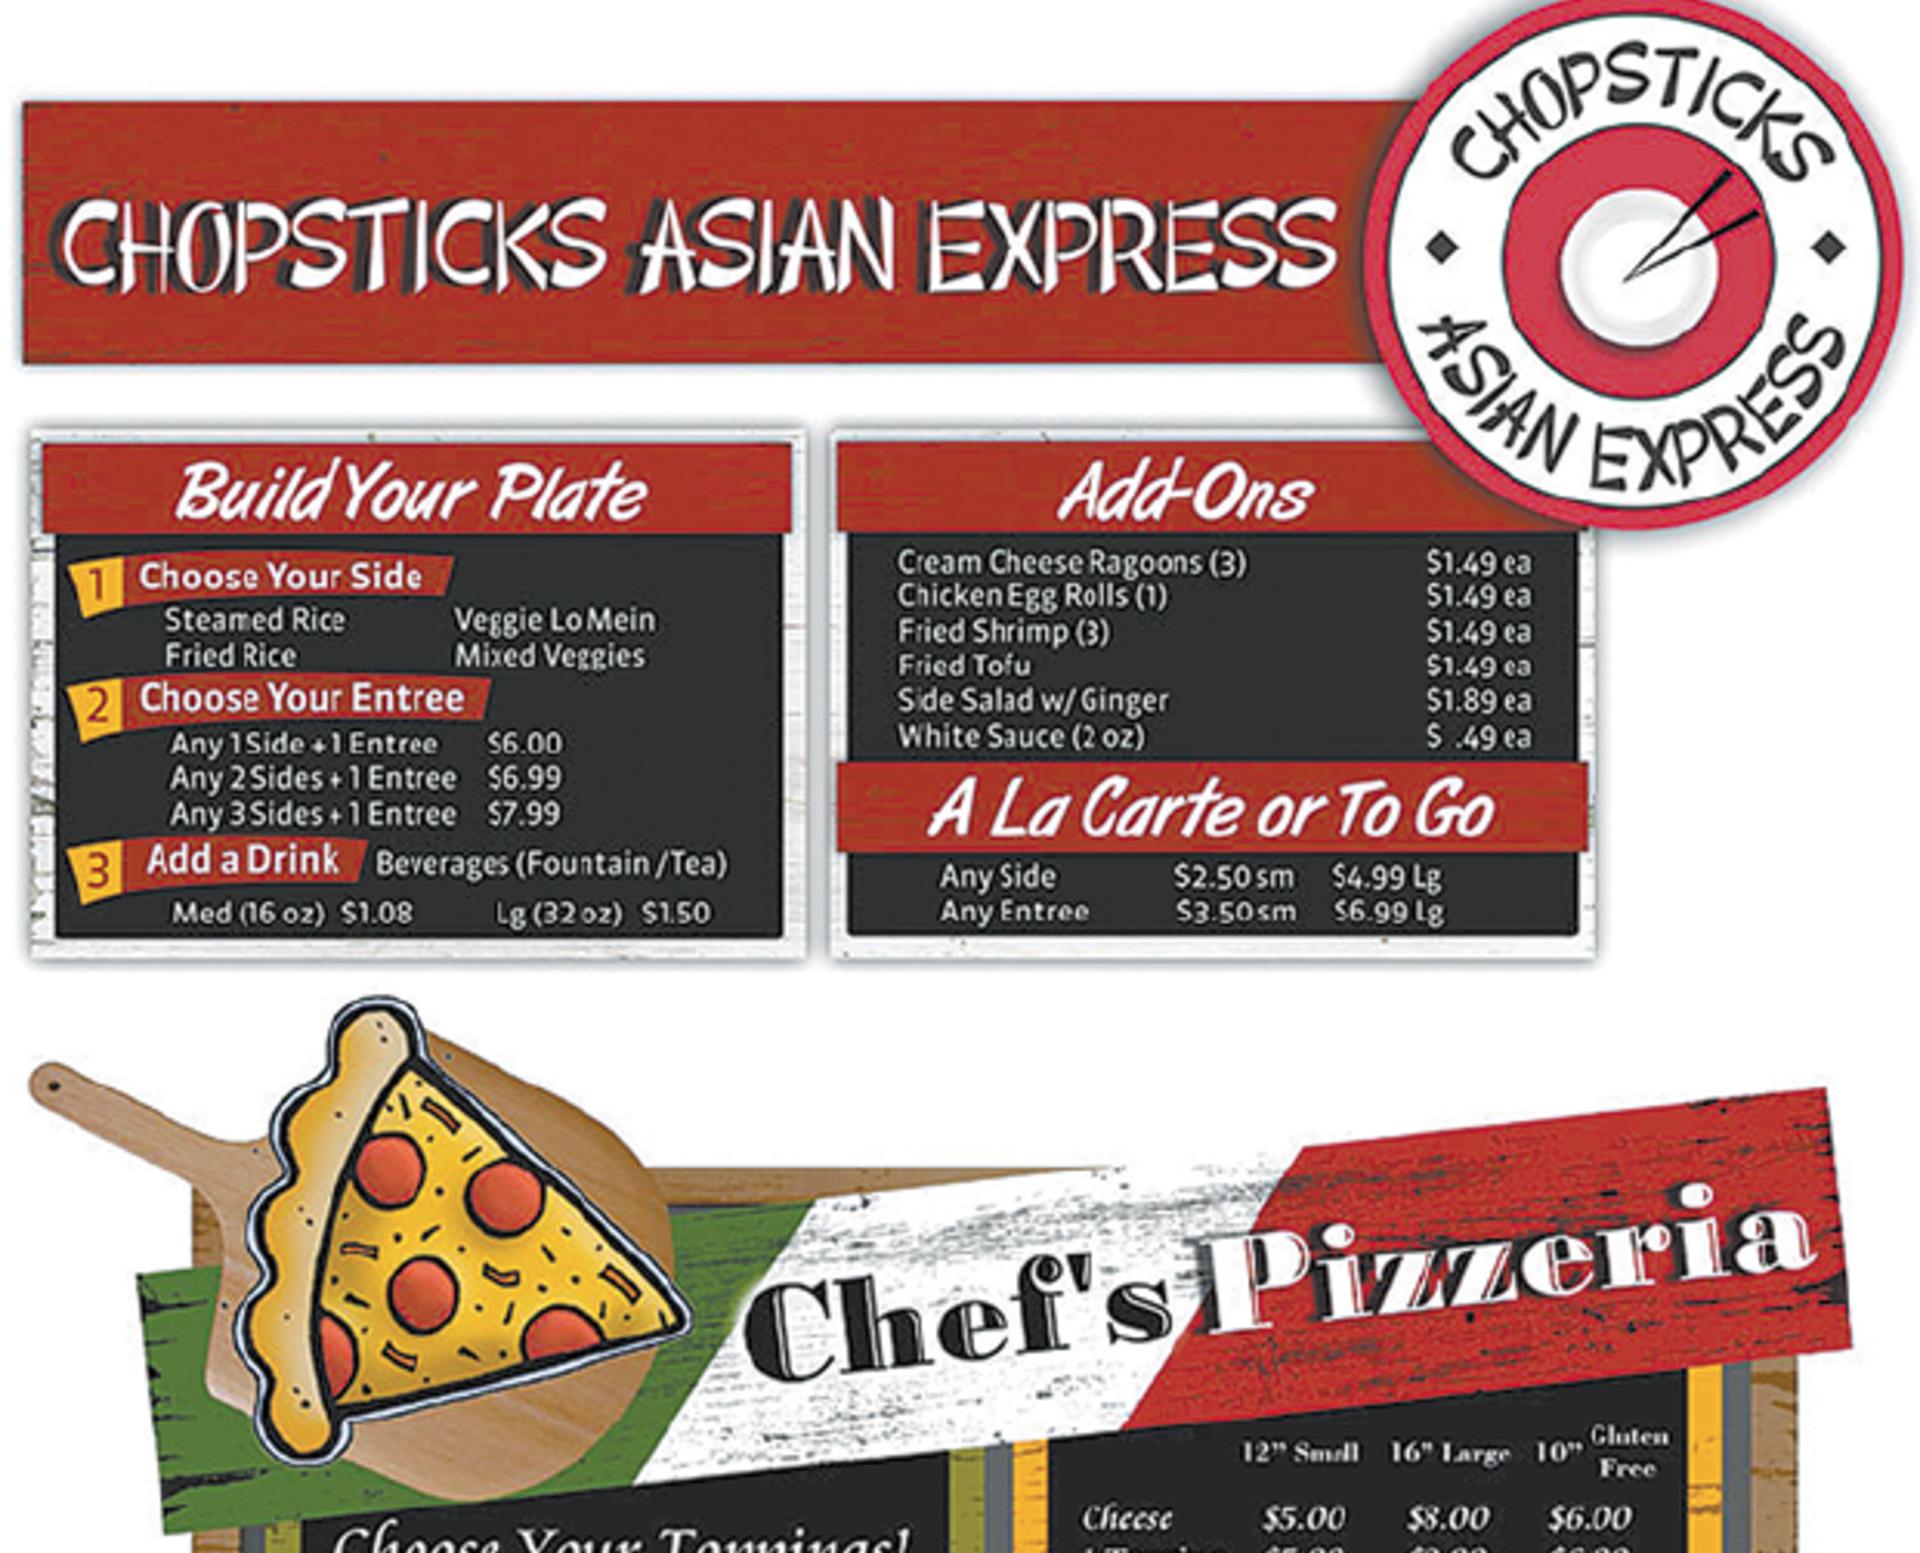 Local Ingles adding jobs, meals-to-go menu